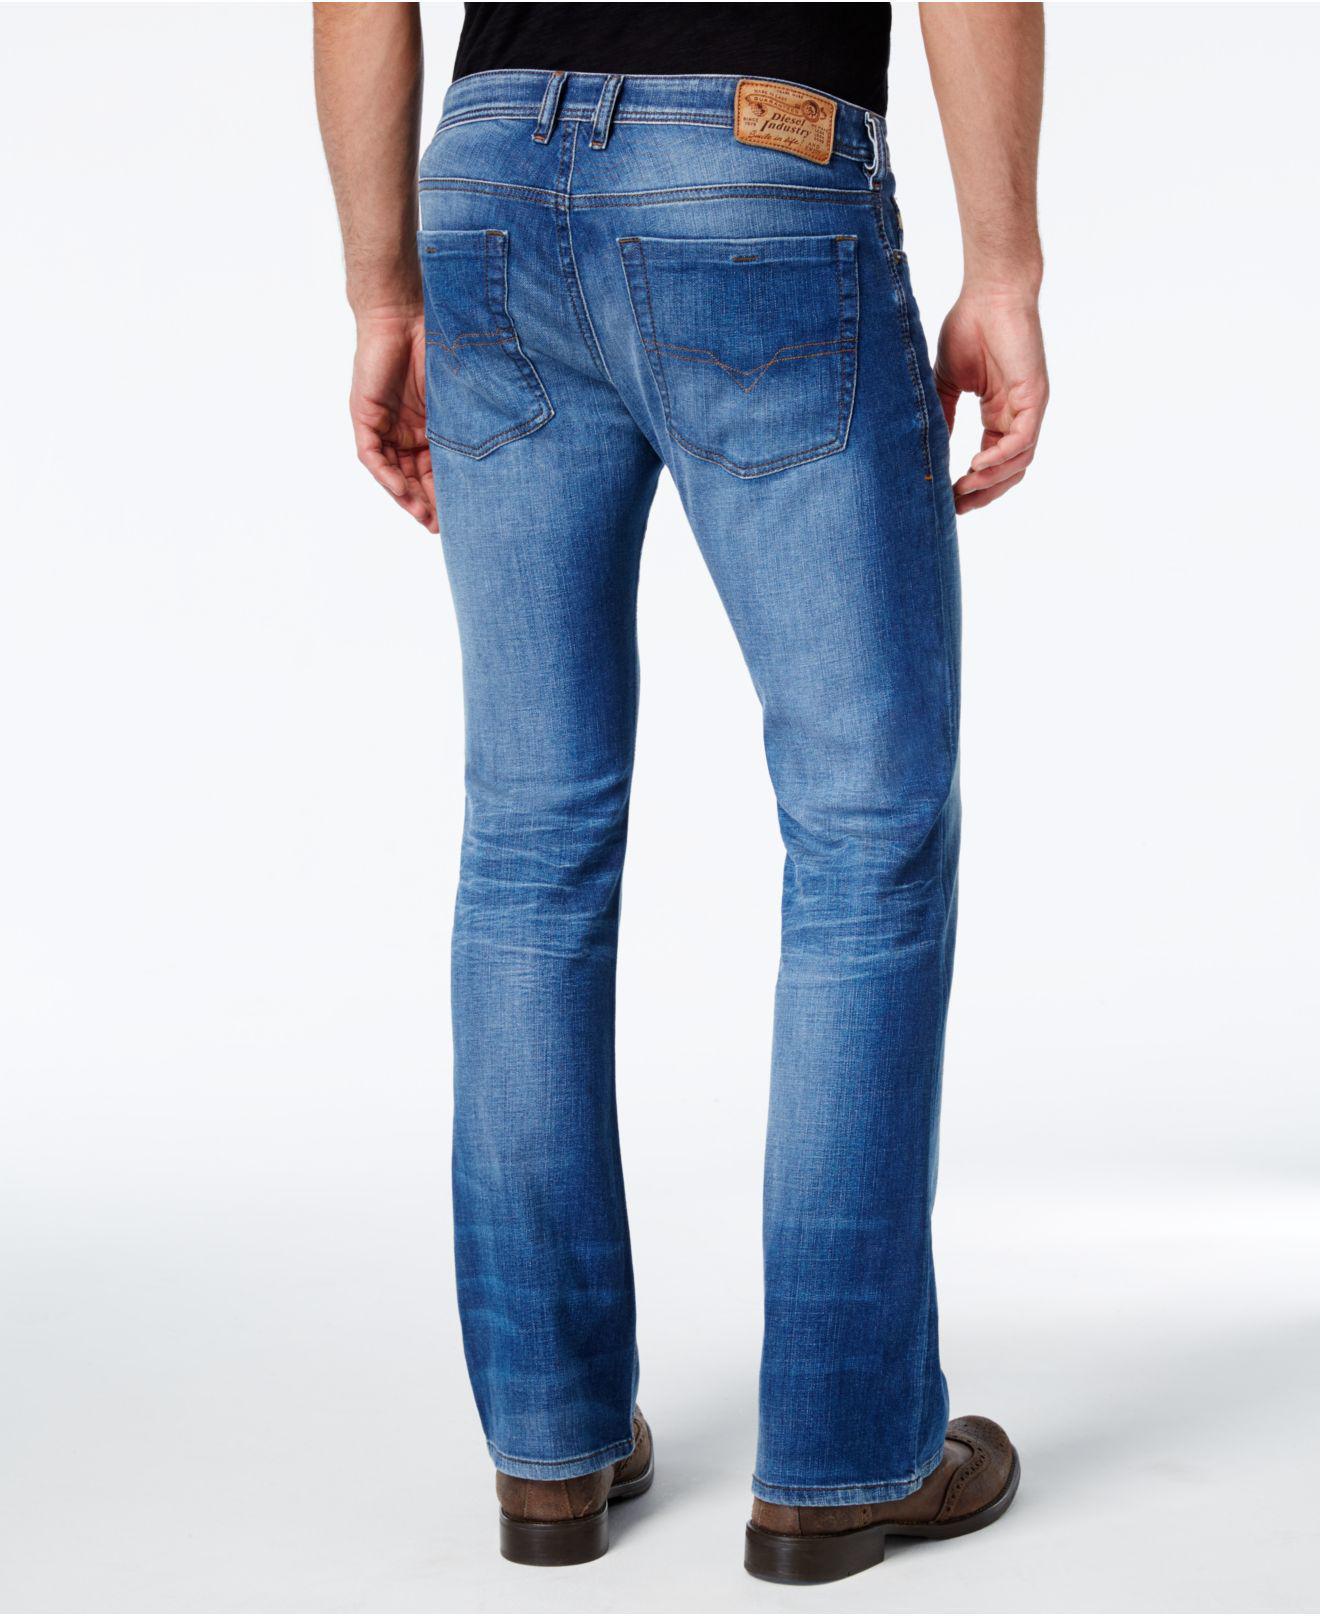 770bcfb4 DIESEL Men's Zathan 0831d Bootcut Jean in Blue for Men - Lyst